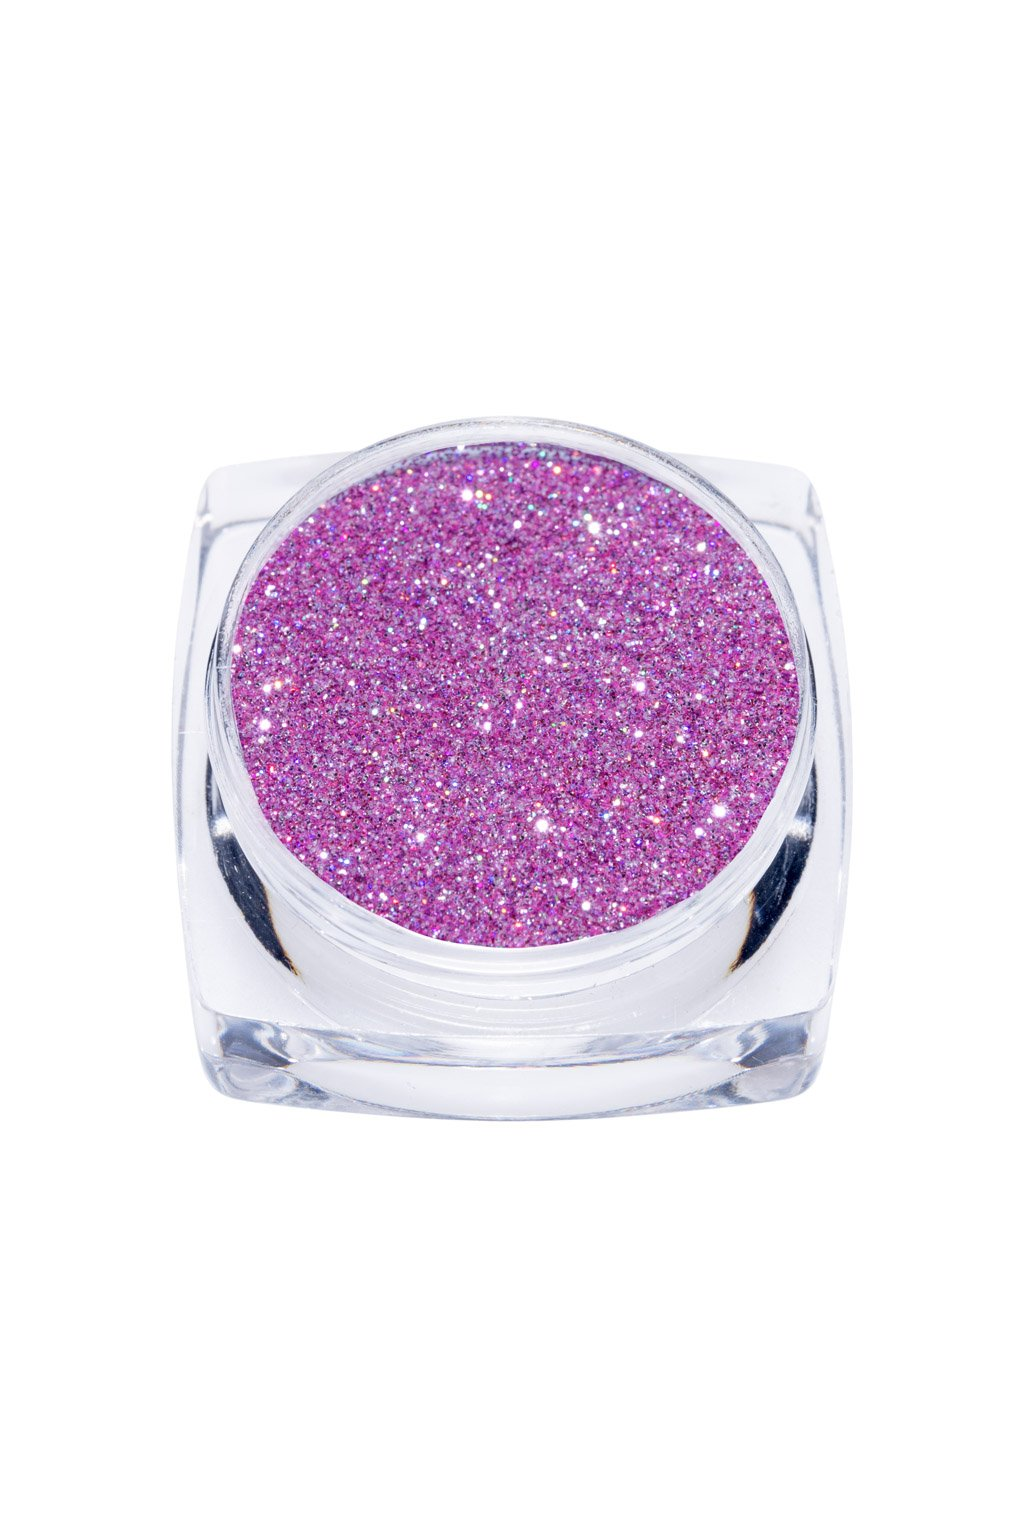 23567 sparkling mix sweet